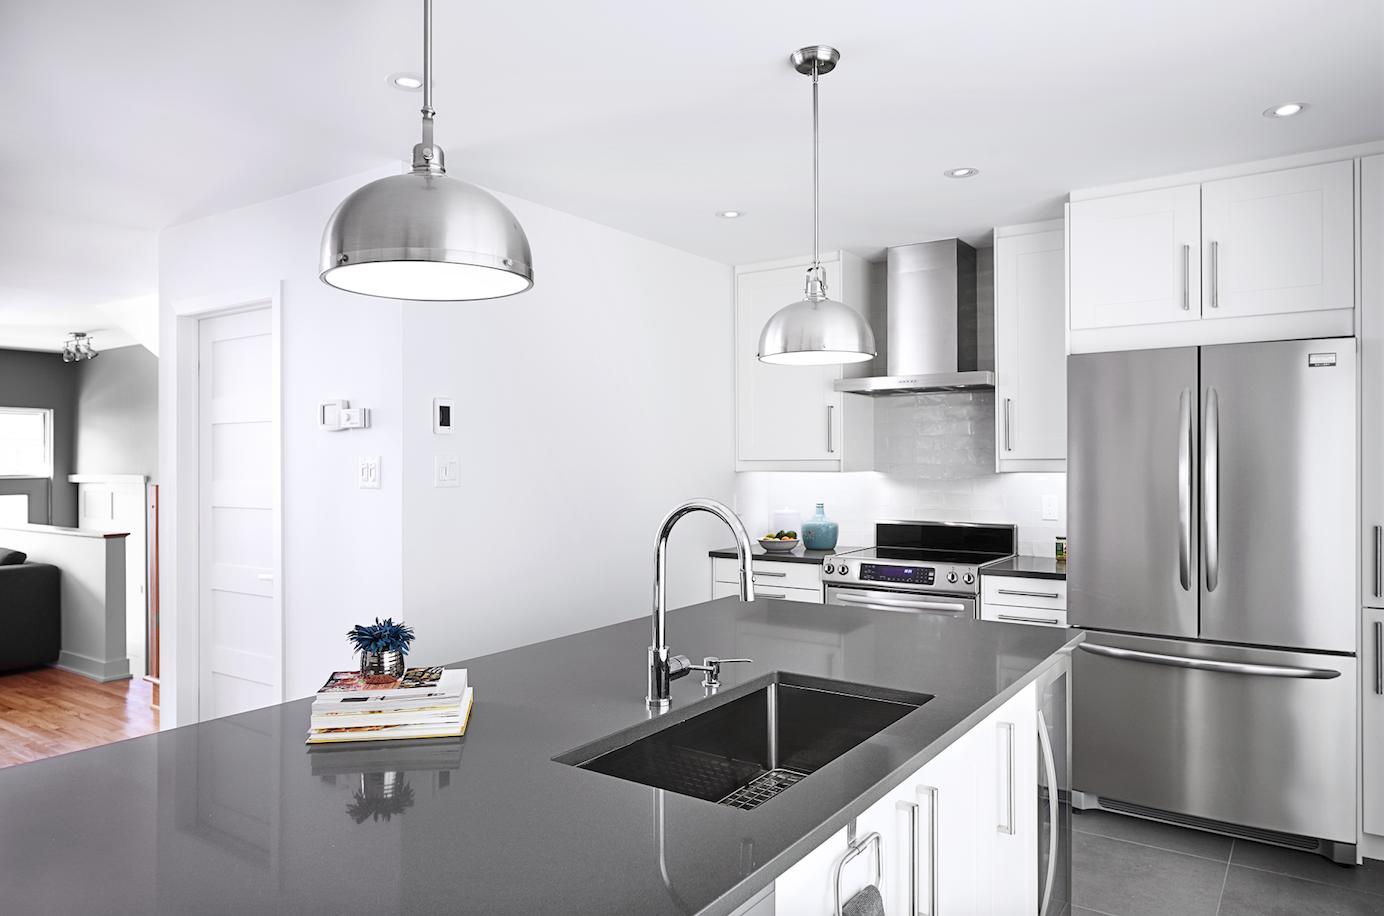 homewise-innovations-sylvio-kitchen-renovations-toronto4